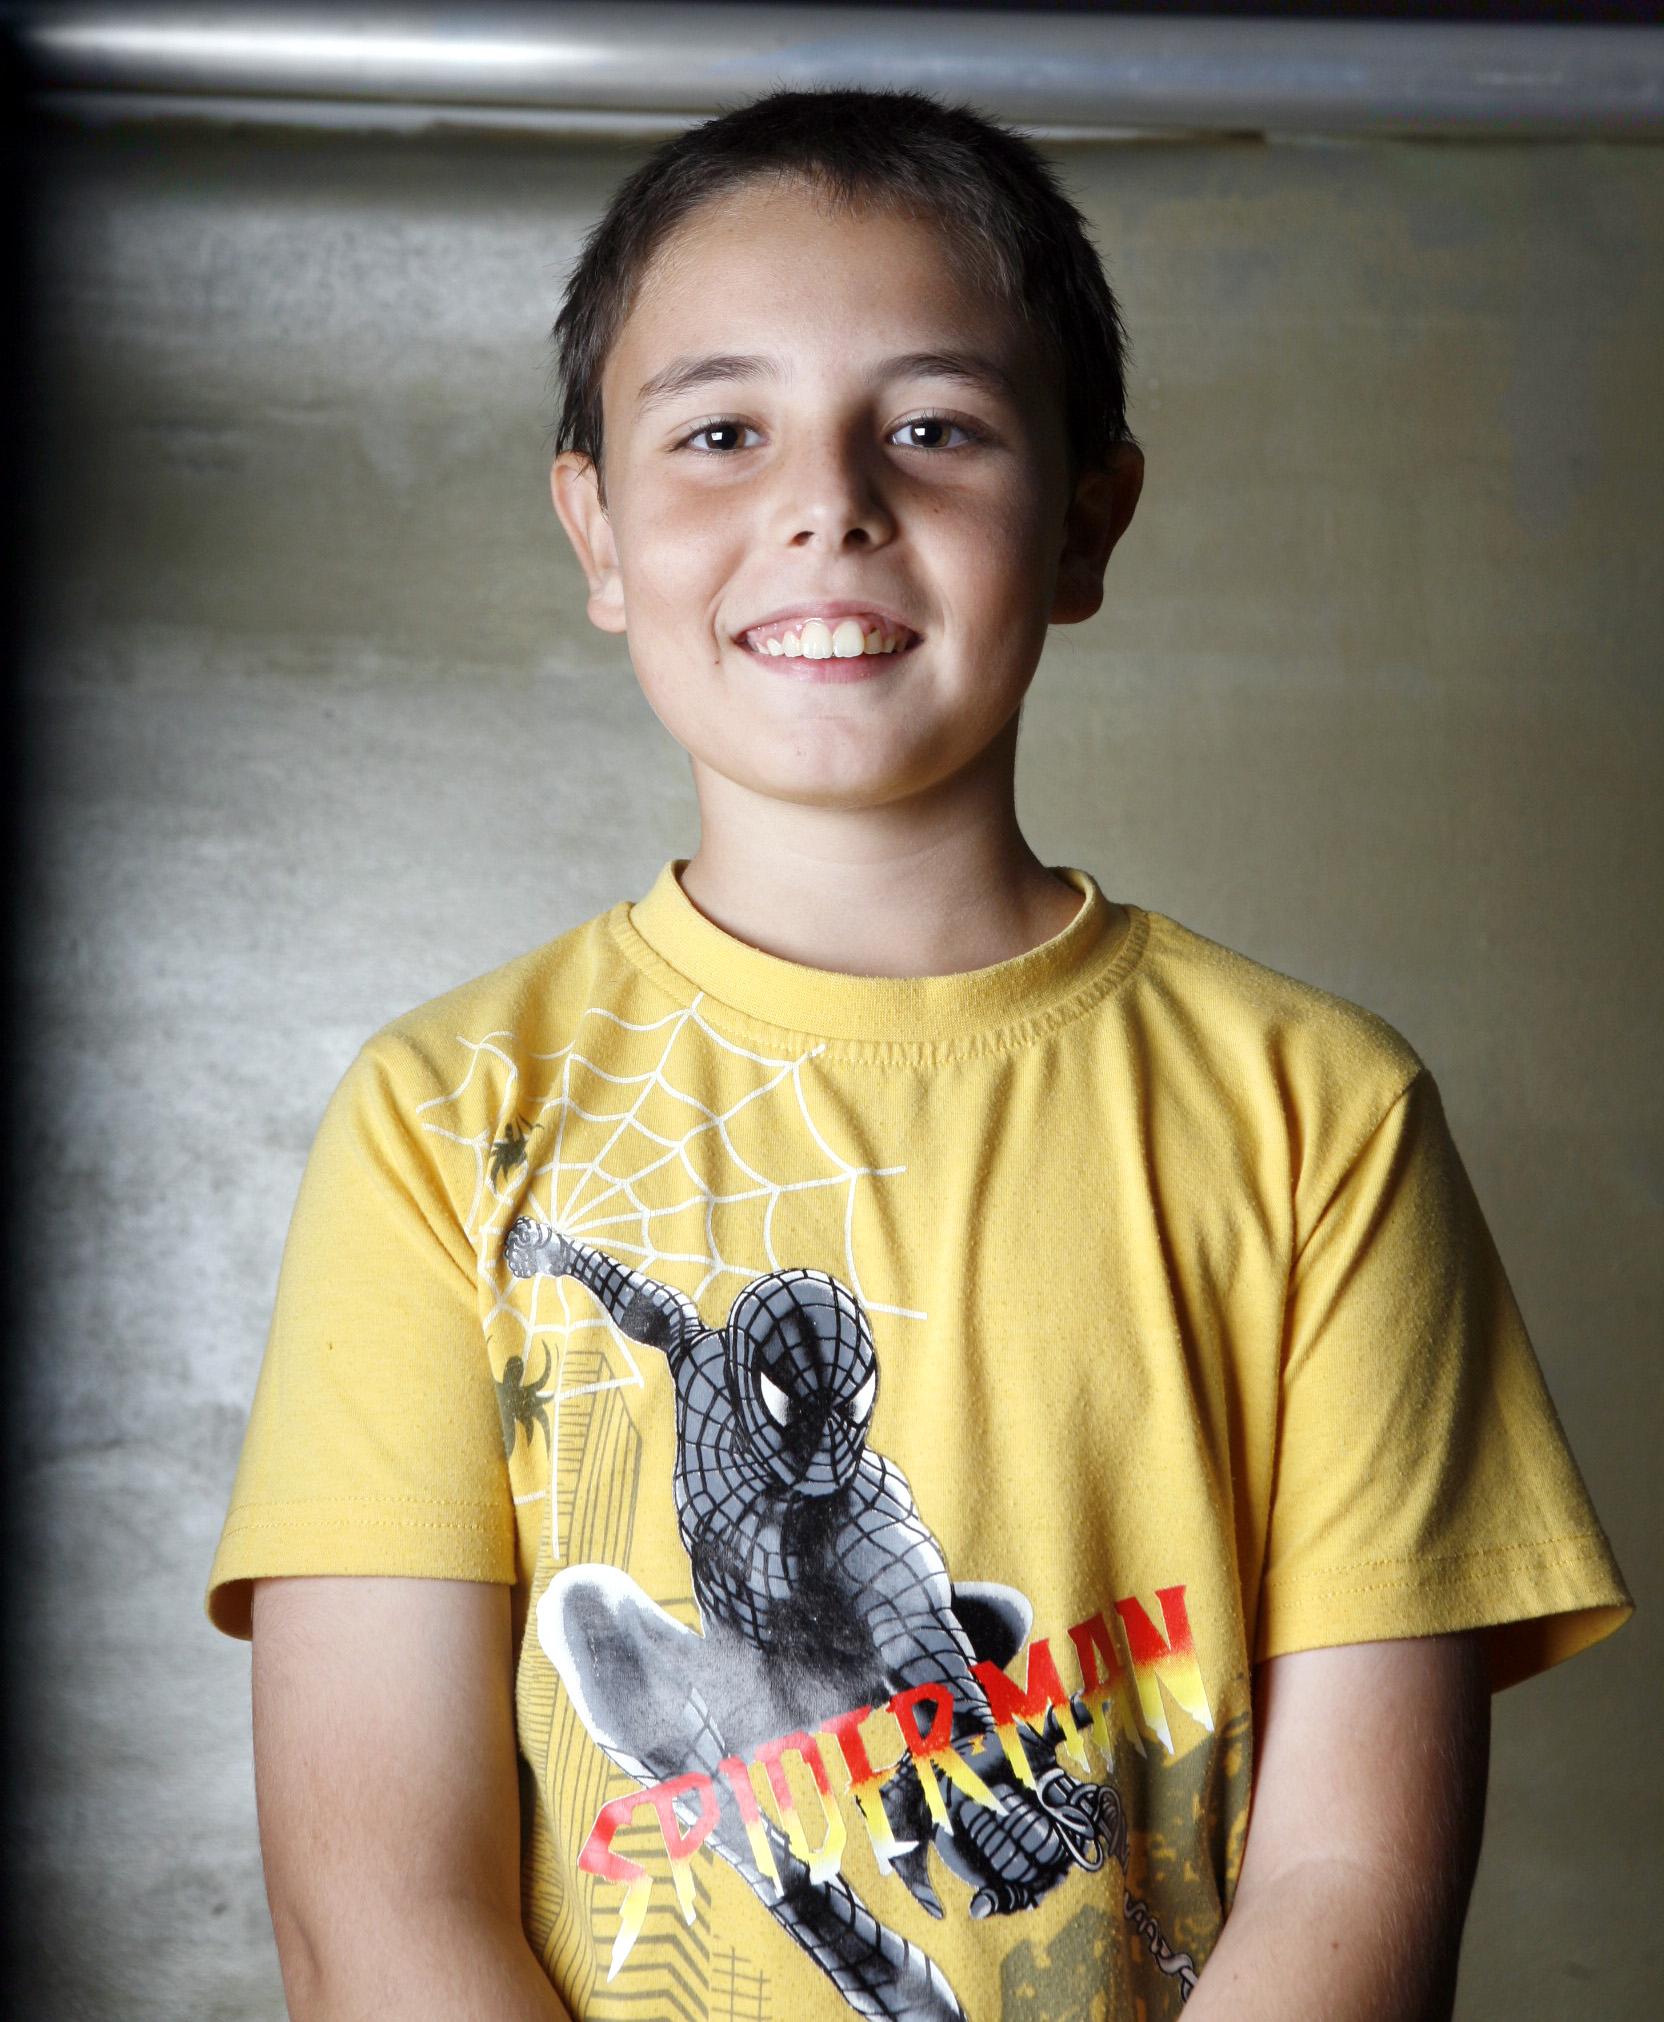 Fran gala deporte 10-11